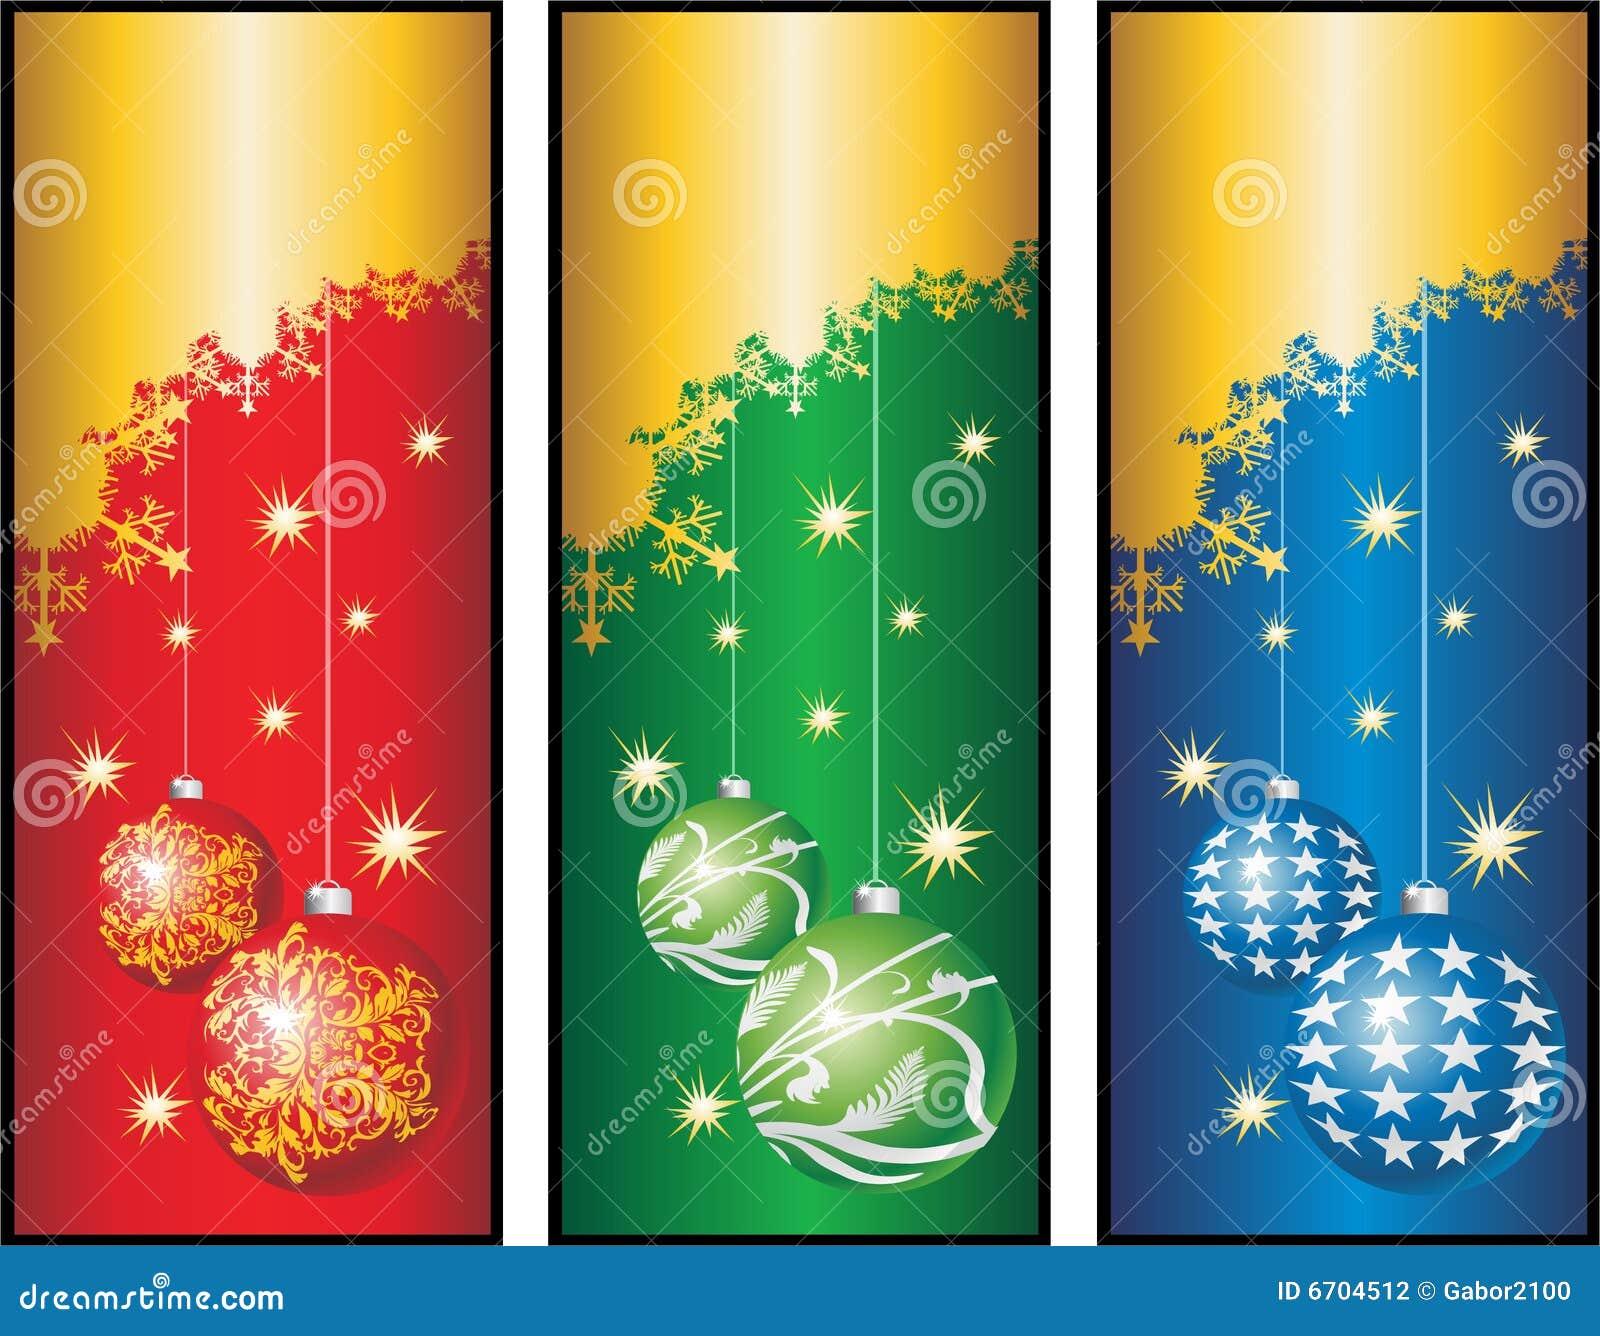 christmas banners cdr stock photography